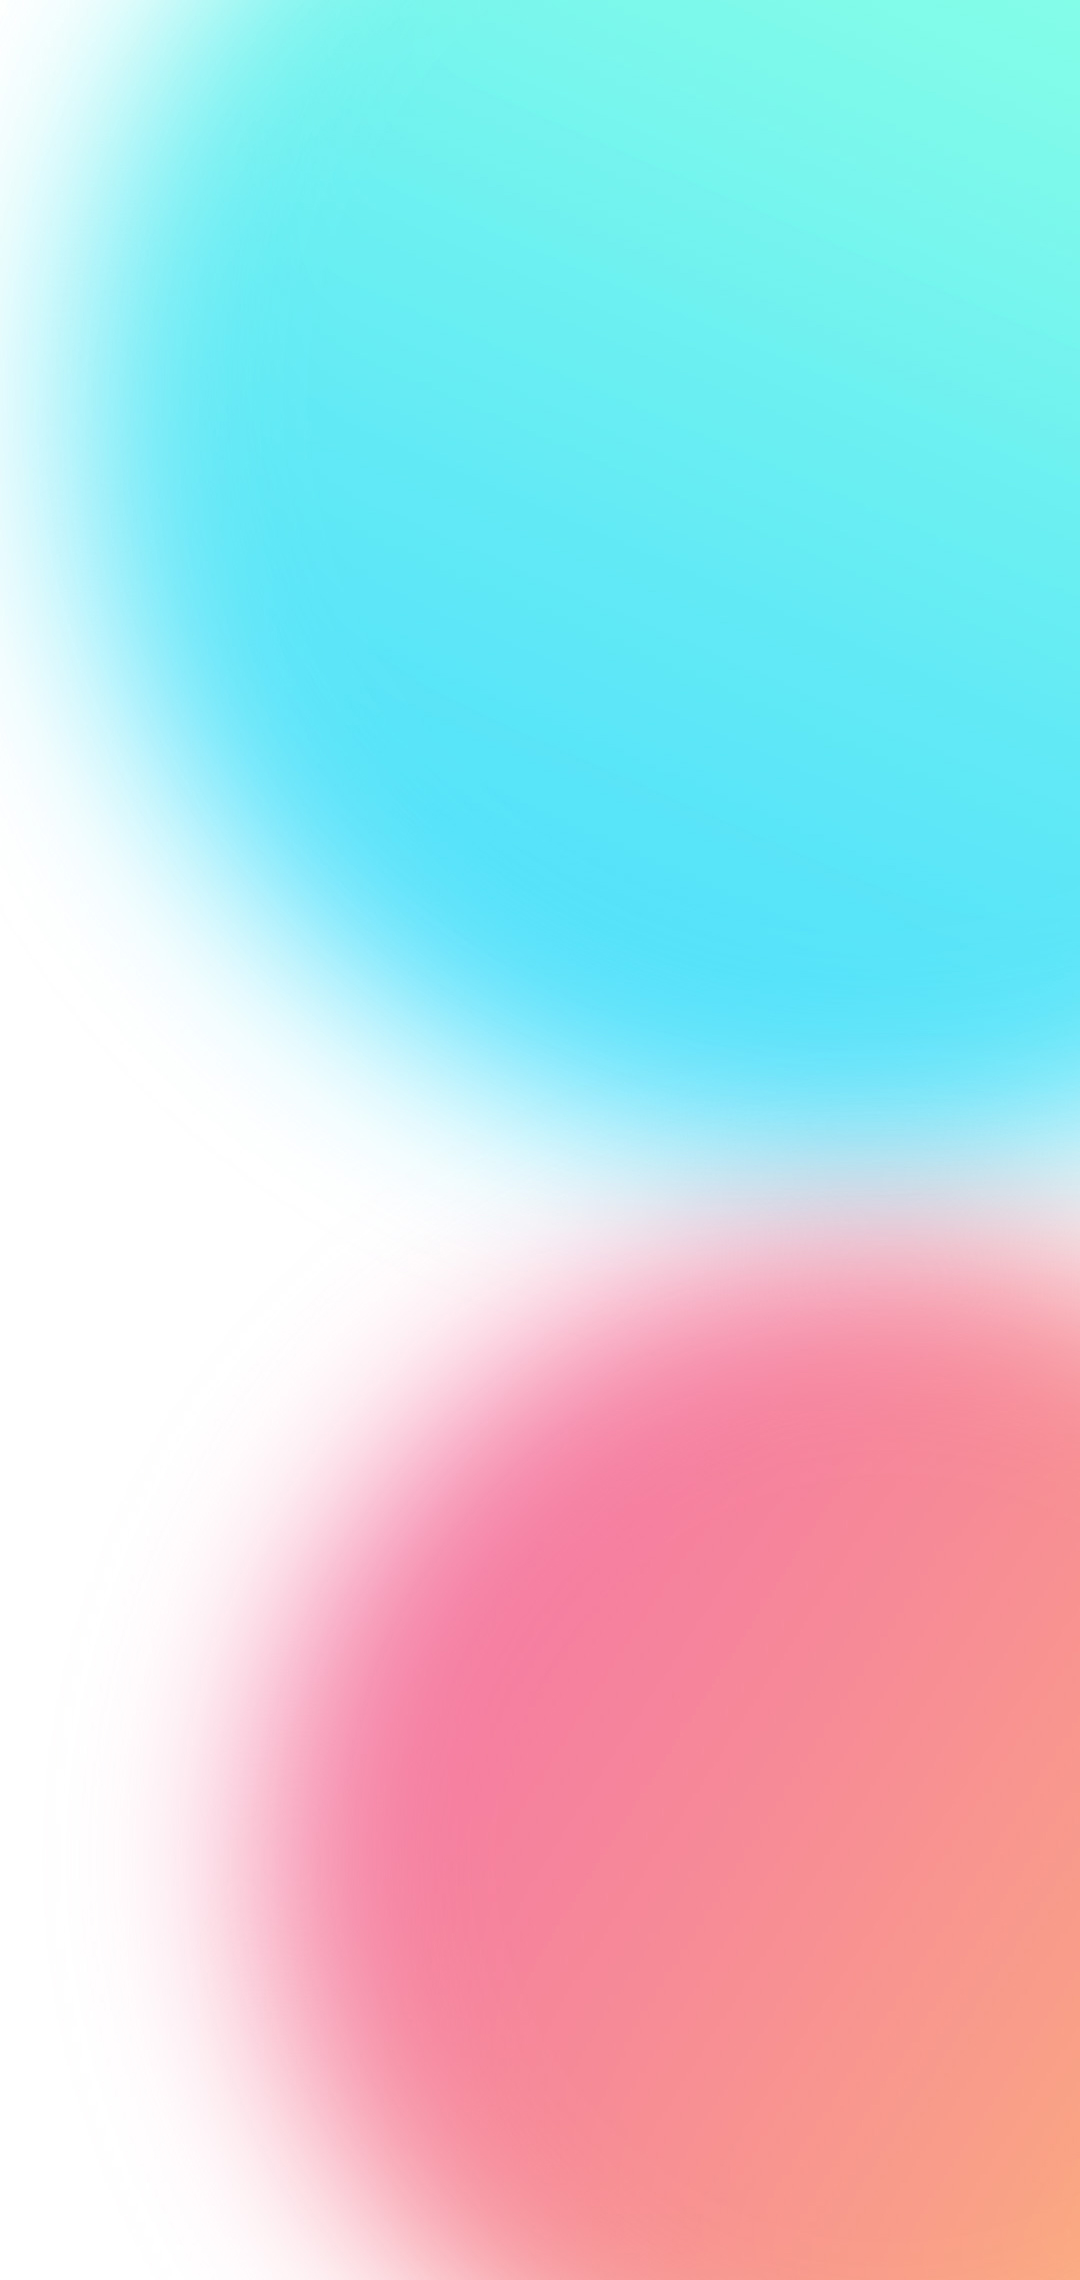 Unduh 580+ Wallpaper Xiaomi Redmi 6a HD Paling Keren